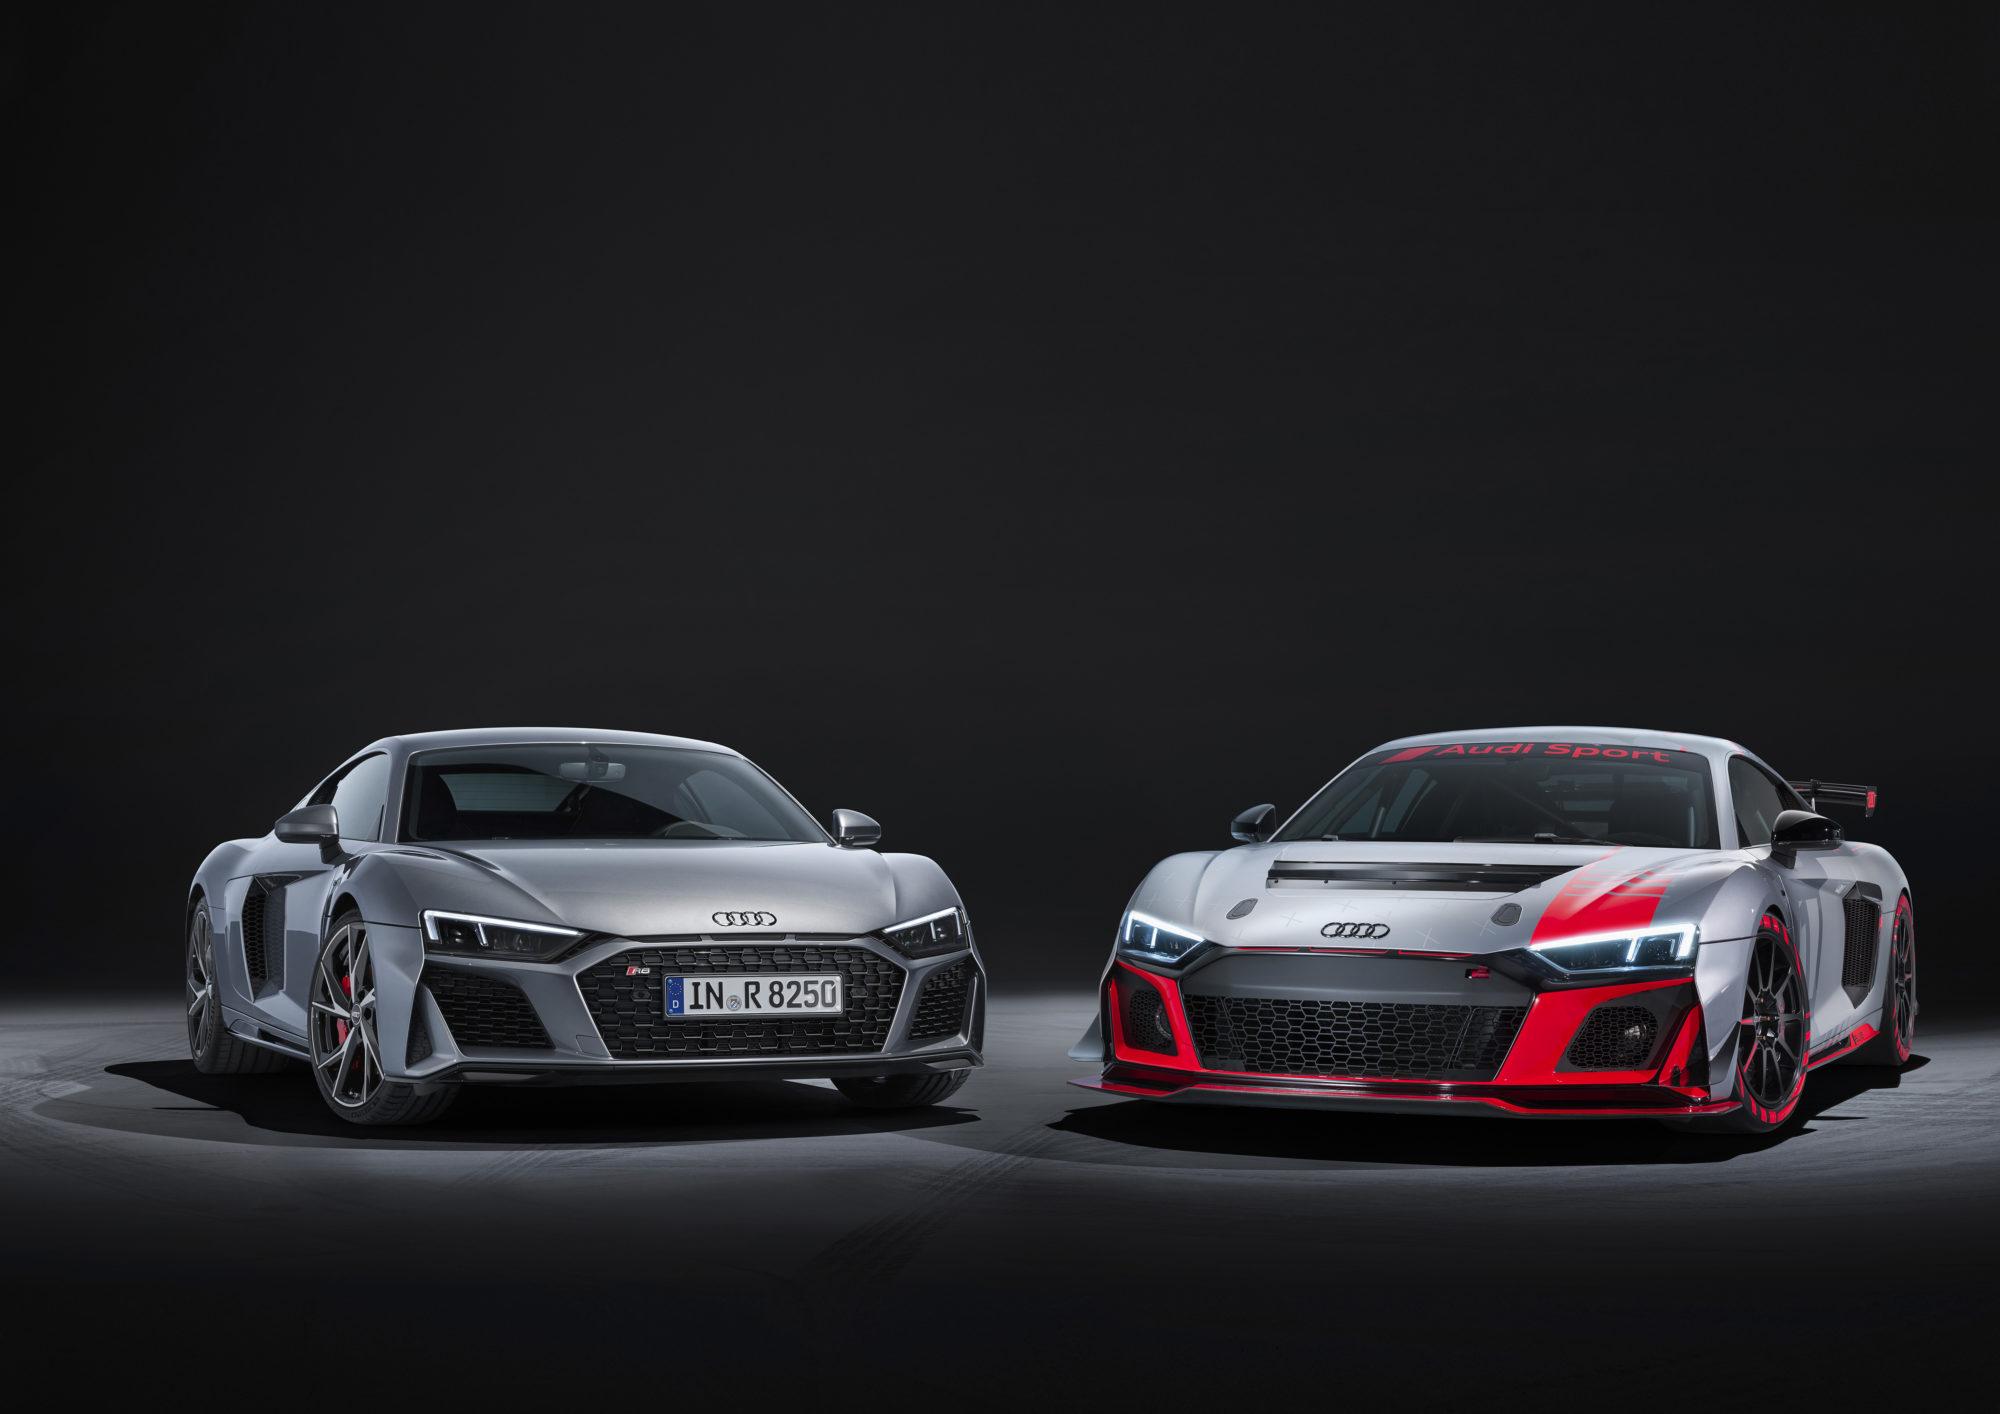 GT8-Sport: Audi R8 LMS erhält neues Design - SportsCar-Info.de   audi luxury sports car